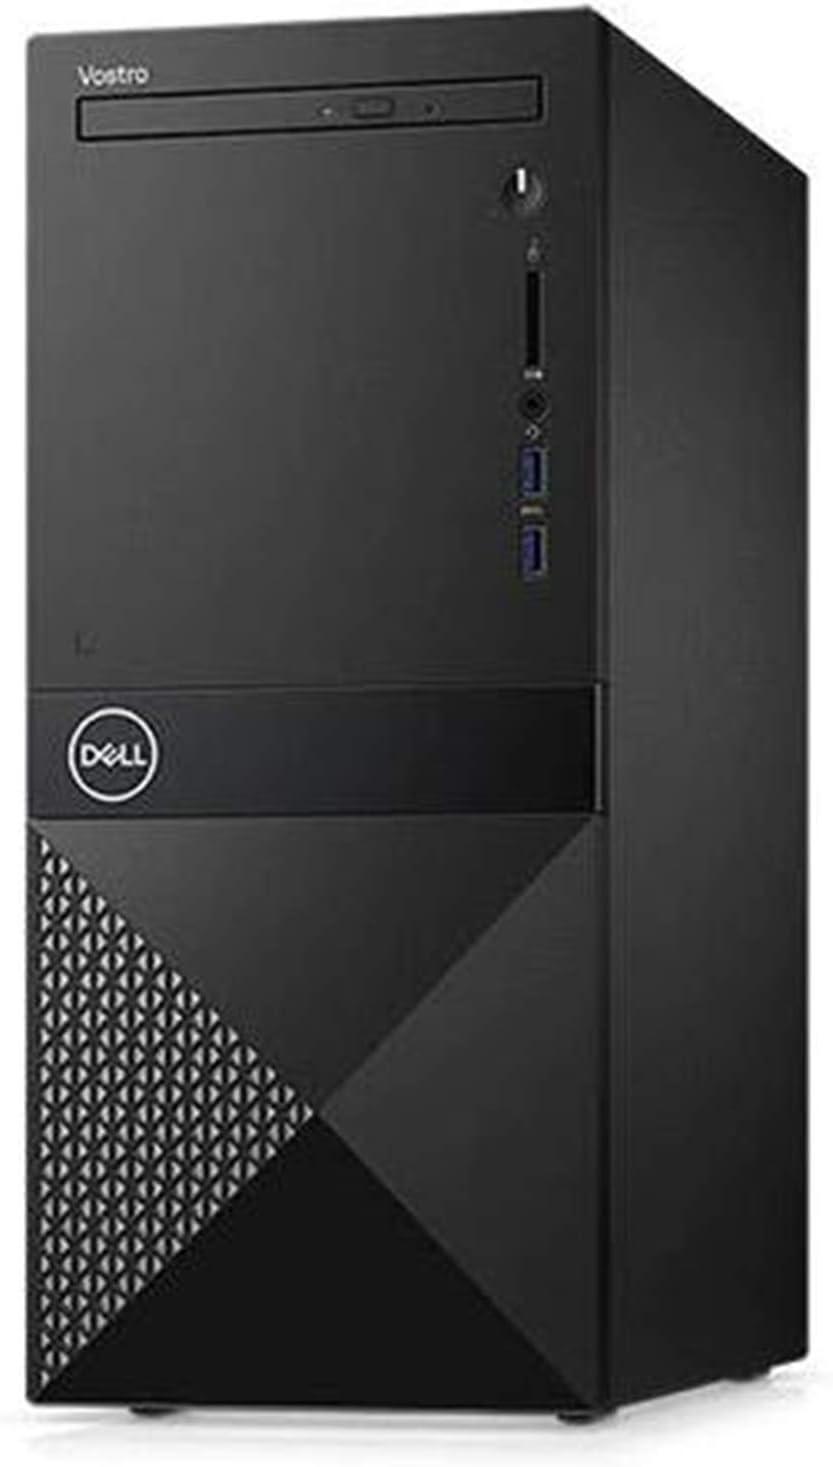 2019 Dell Vostro 3000 Business Desktop Computer 9th Gen Intel Hexa-Core i5-9400 up to 4.1GHz 16GB DDR4 RAM 256GB PCIe SSD DVDRW 802.11bgn WiFi Bluetooth USB 3.0 HDMI Windows 10 Pro